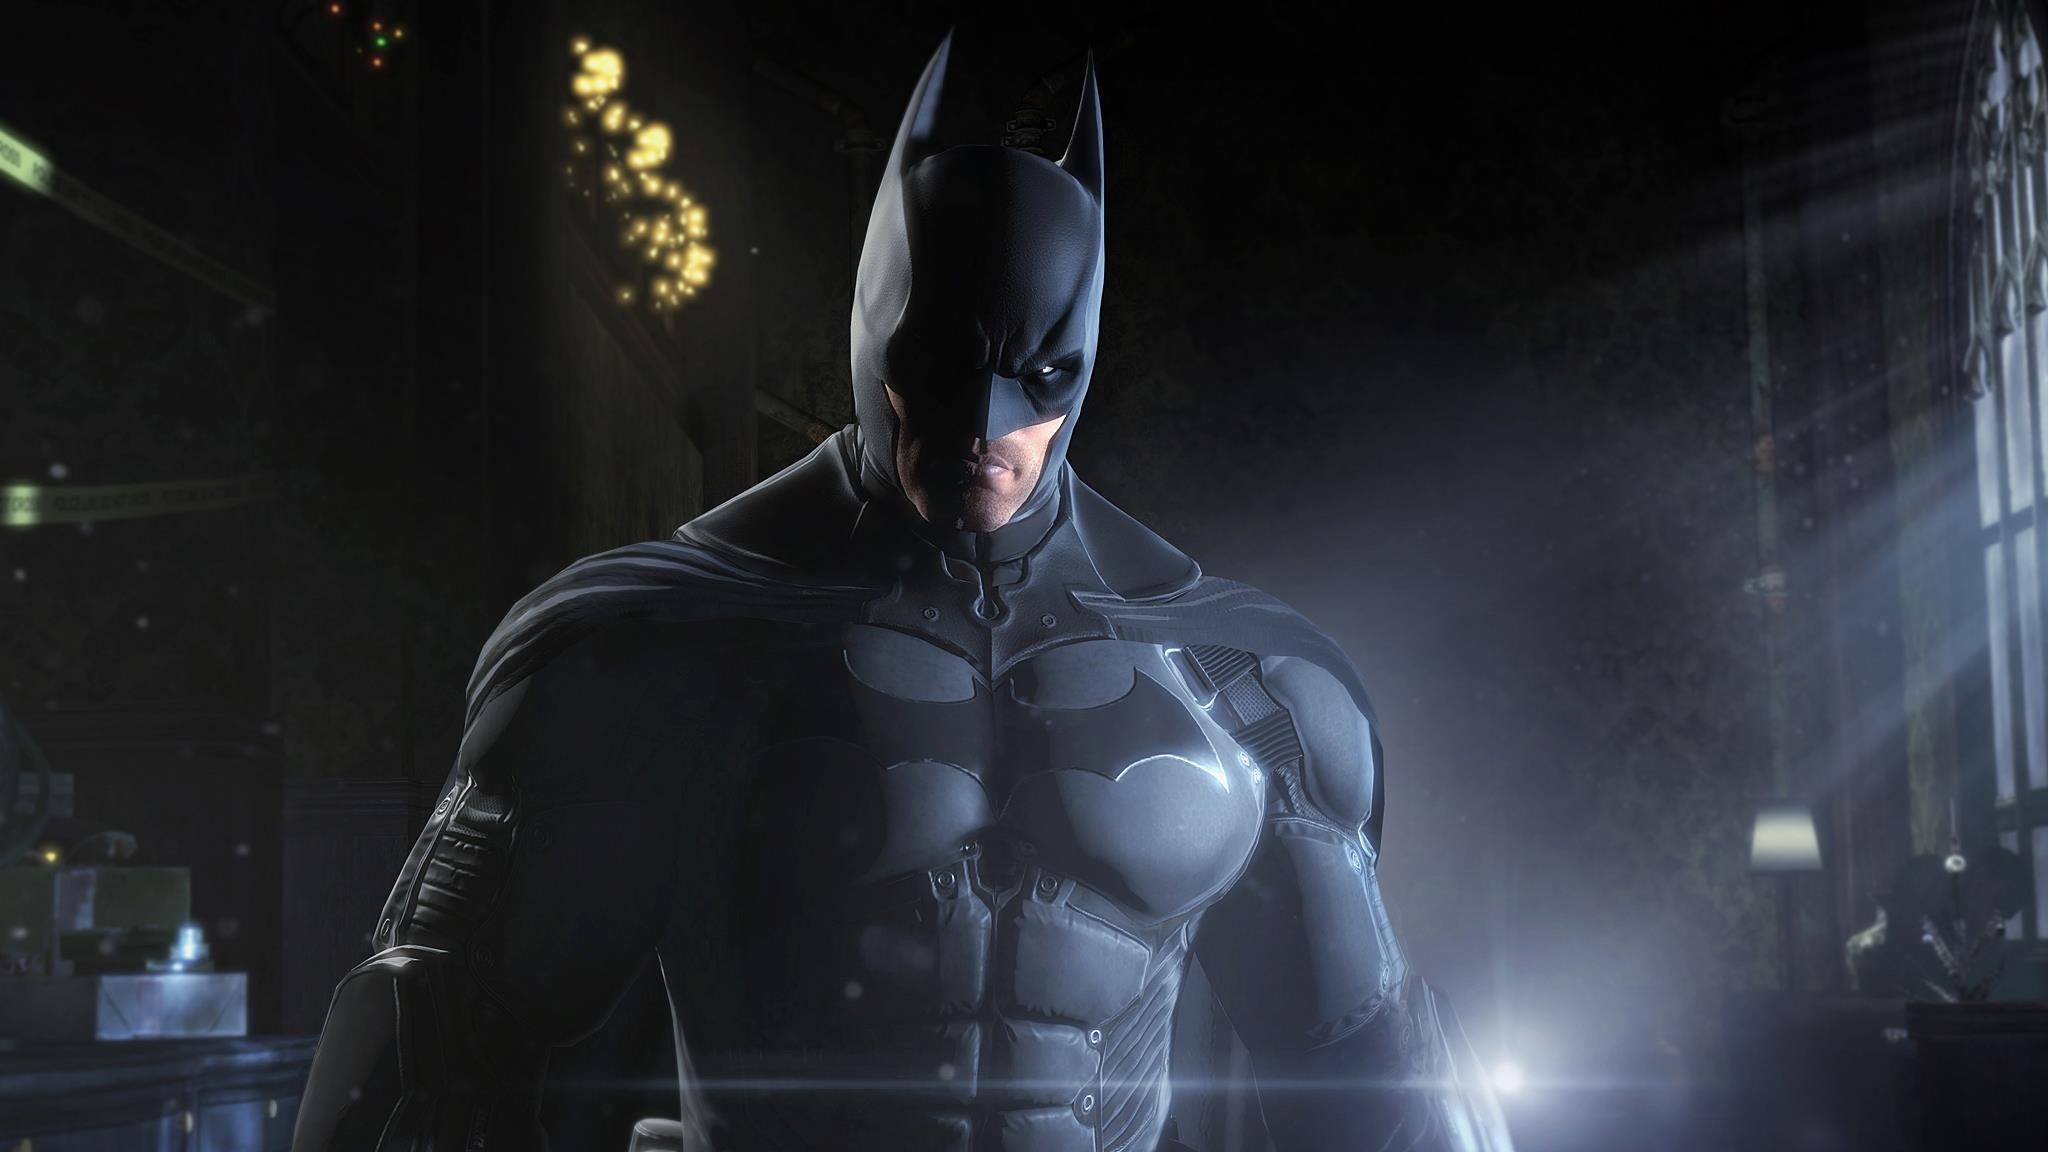 Batman: Arkham Origins Screenshots Are Full Of Christmas Cheer #26508